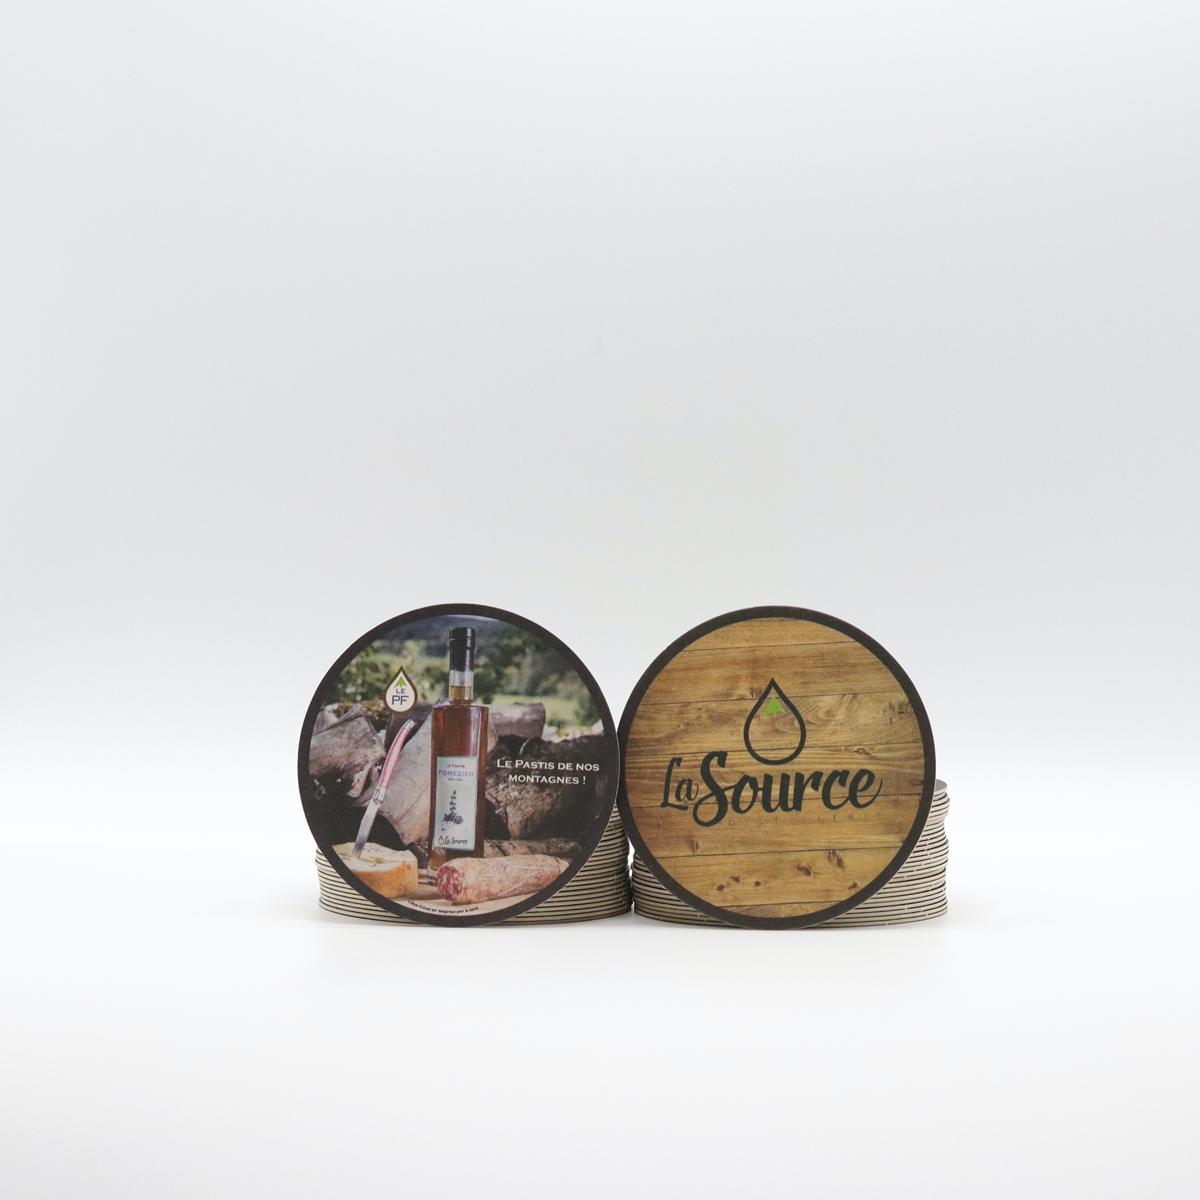 https://www.lasource-distillerie.fr/wp-content/uploads/2020/11/dessous-de-verre.jpg